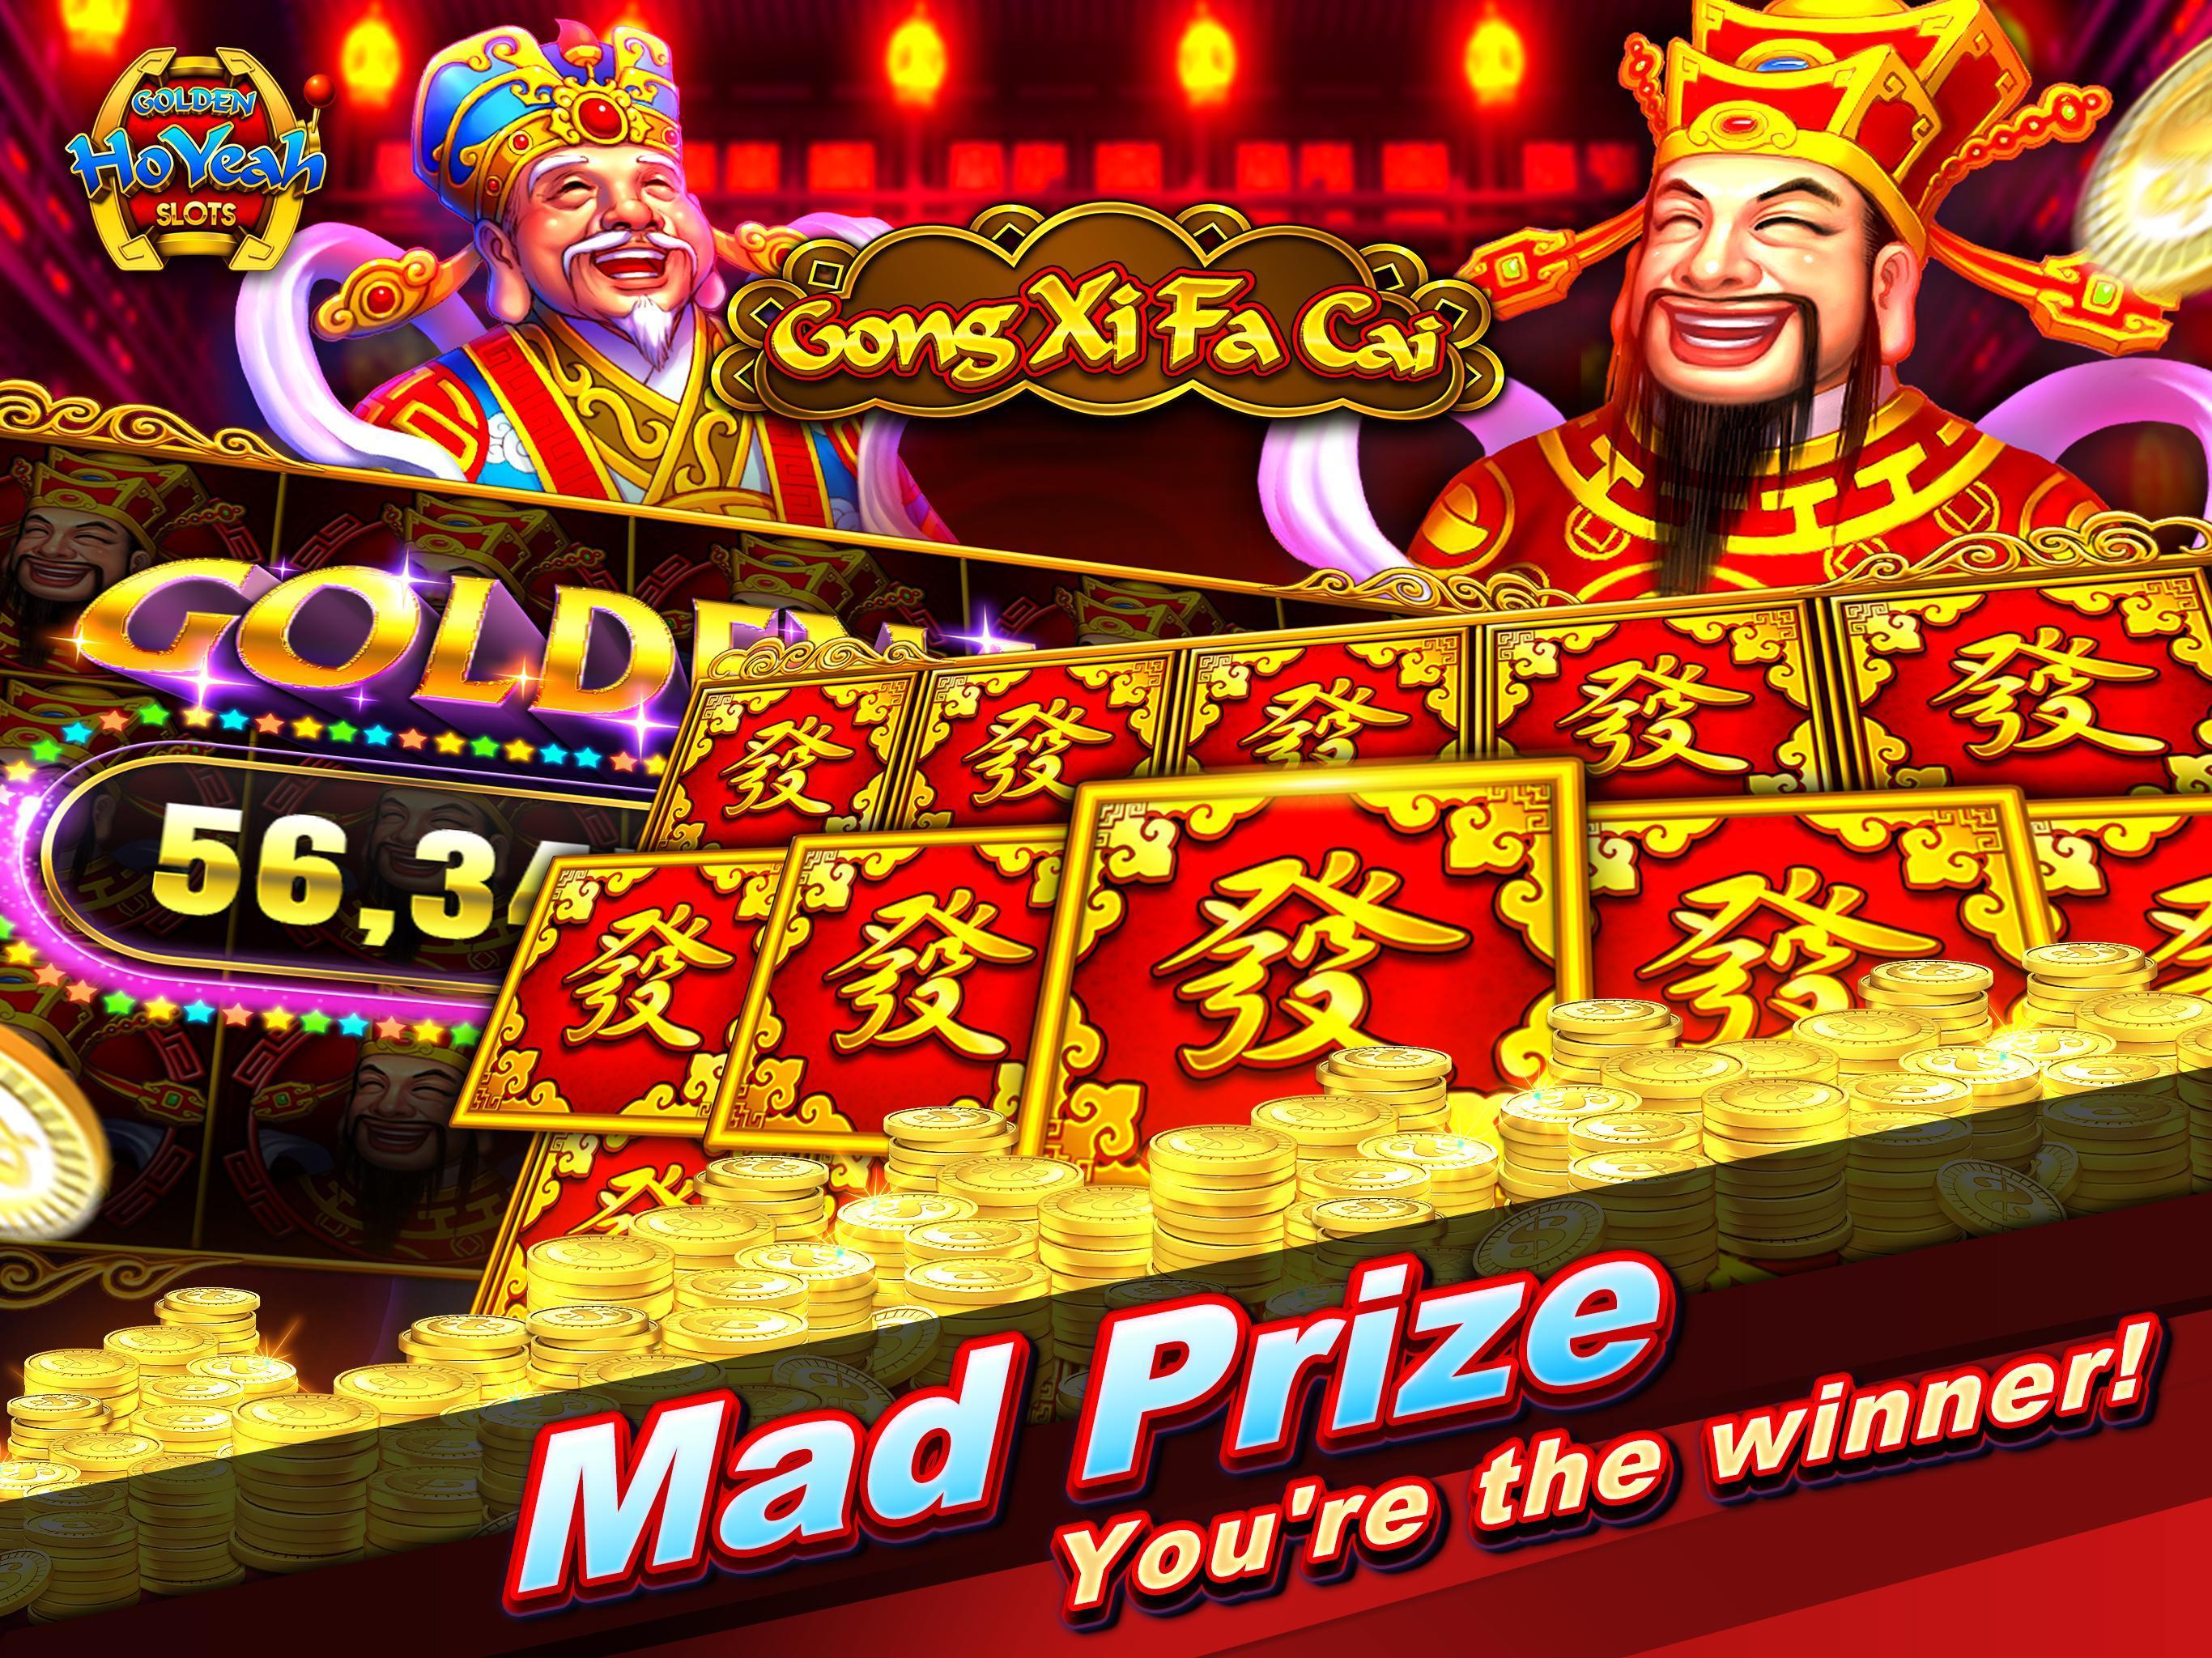 Slots (Golden HoYeah) - Casino Slots 2.5.7 Screenshot 17